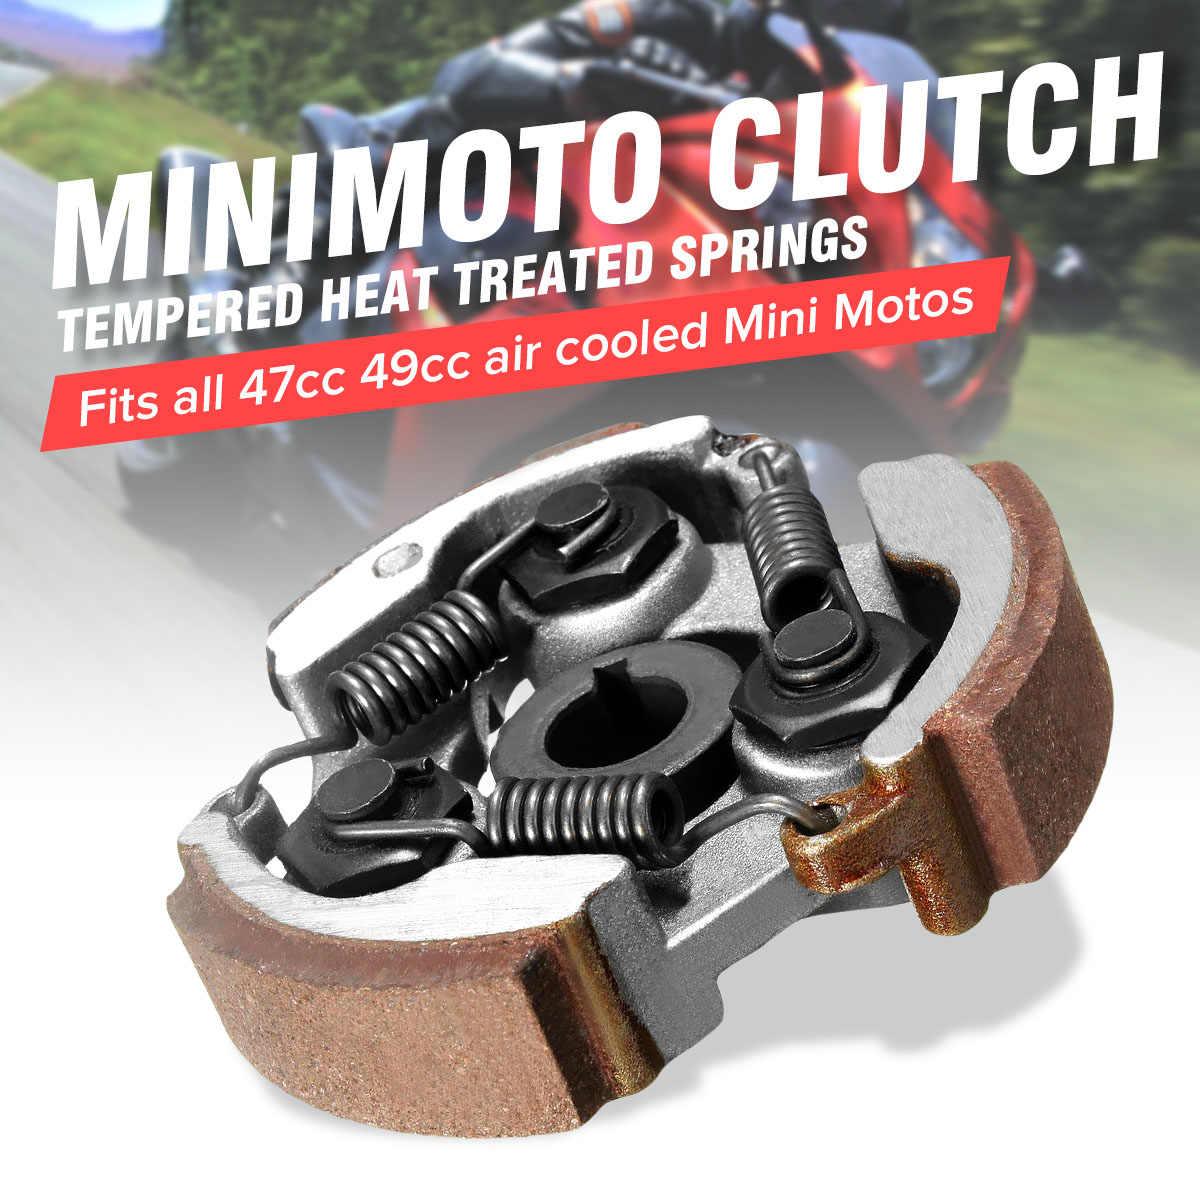 2 Stroke 47cc 49cc Moto Bersepeda Mini Moto Kopling Sentrifugal Alloy Mini Moto Dirt Bike Atv Quad 3 Sepatu Musim Semi